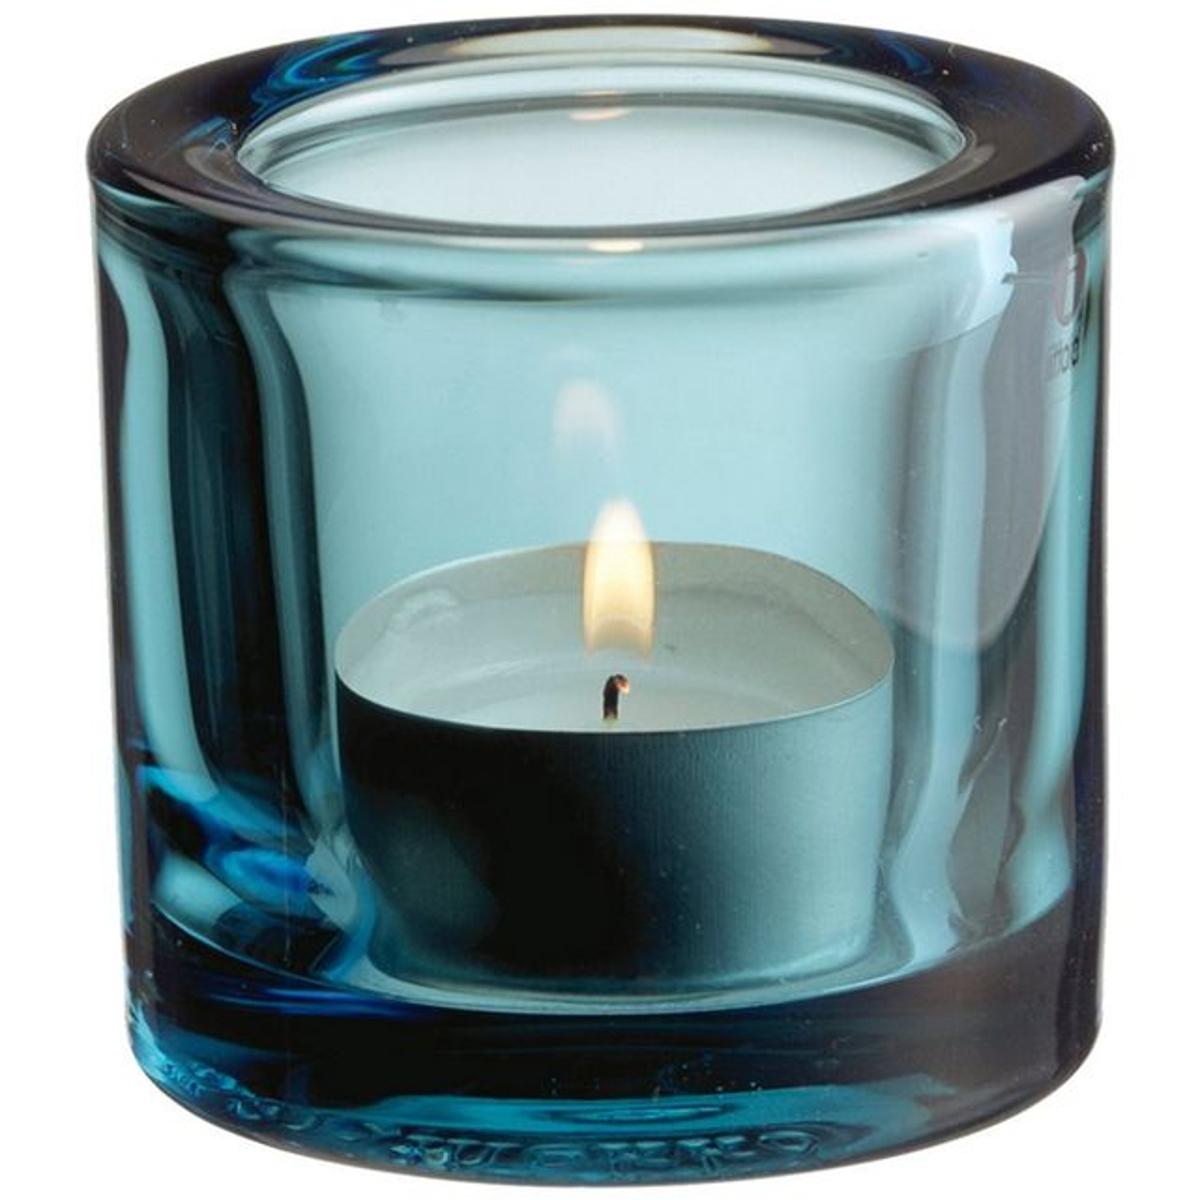 Support à bougie chauffe-plat iittala Kivi- Bleu marine